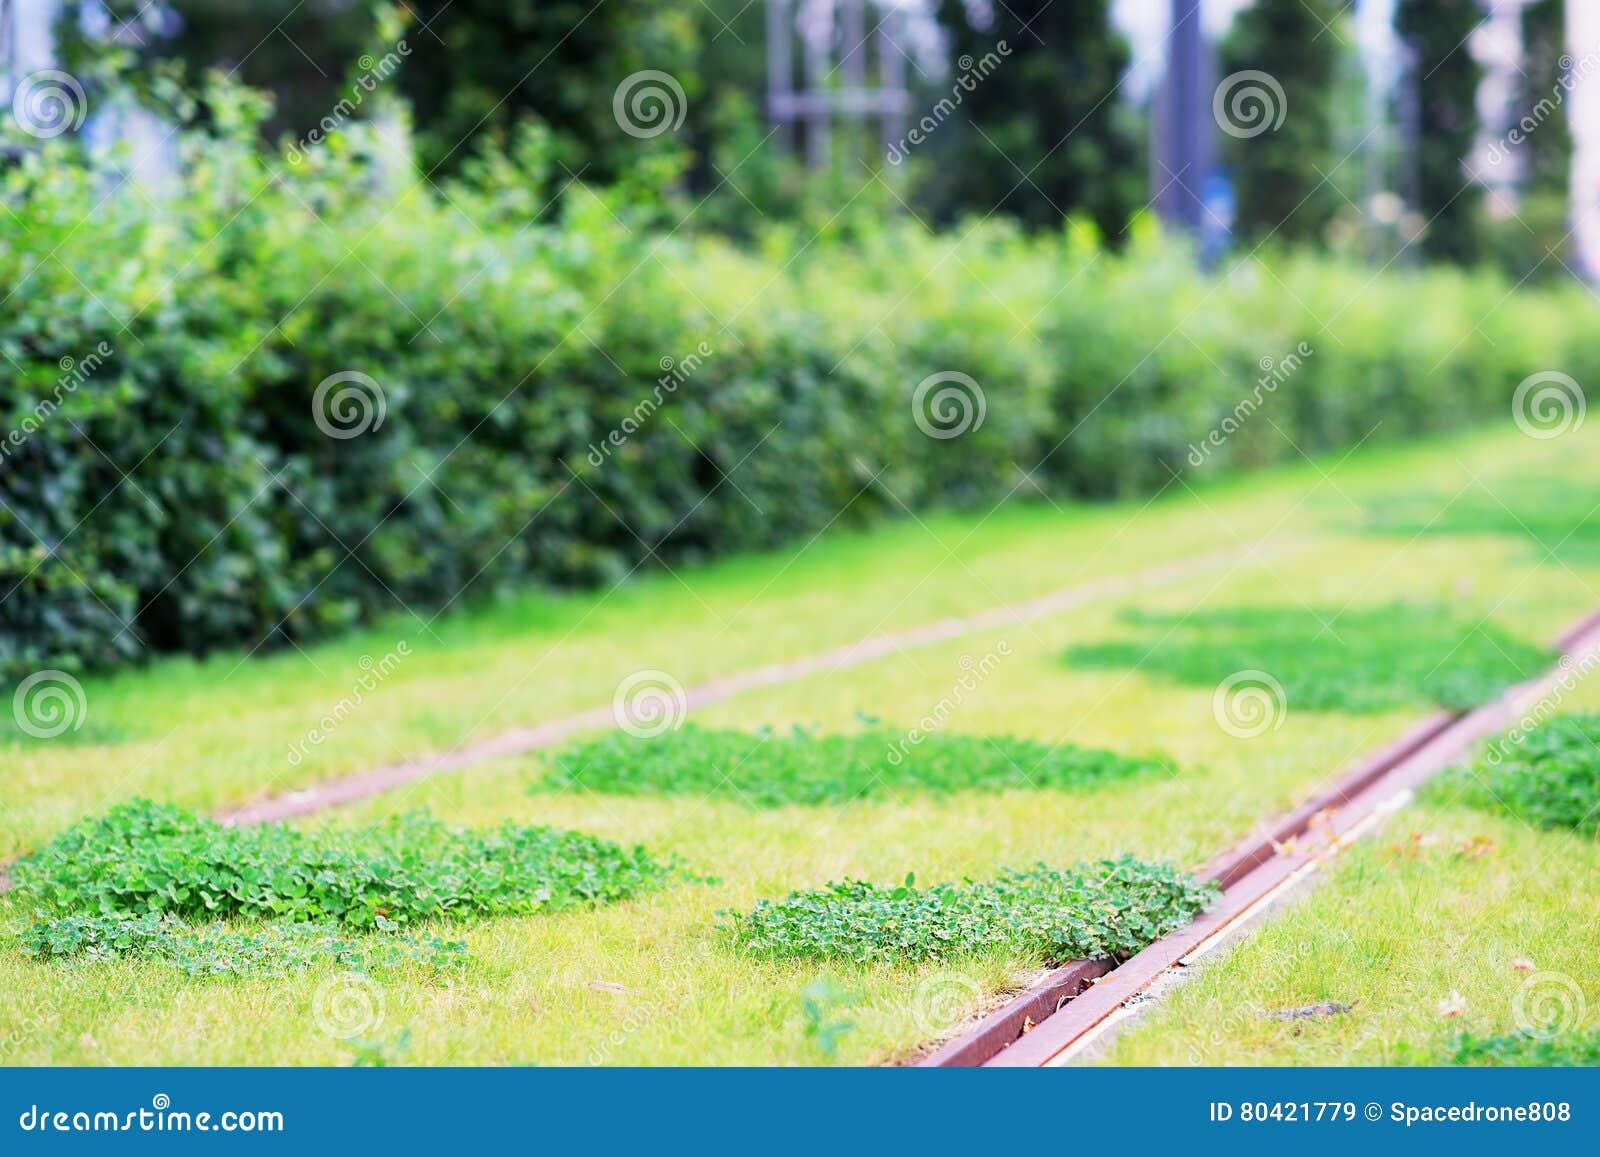 Download 610 Koleksi Background Hd Grass HD Terbaru